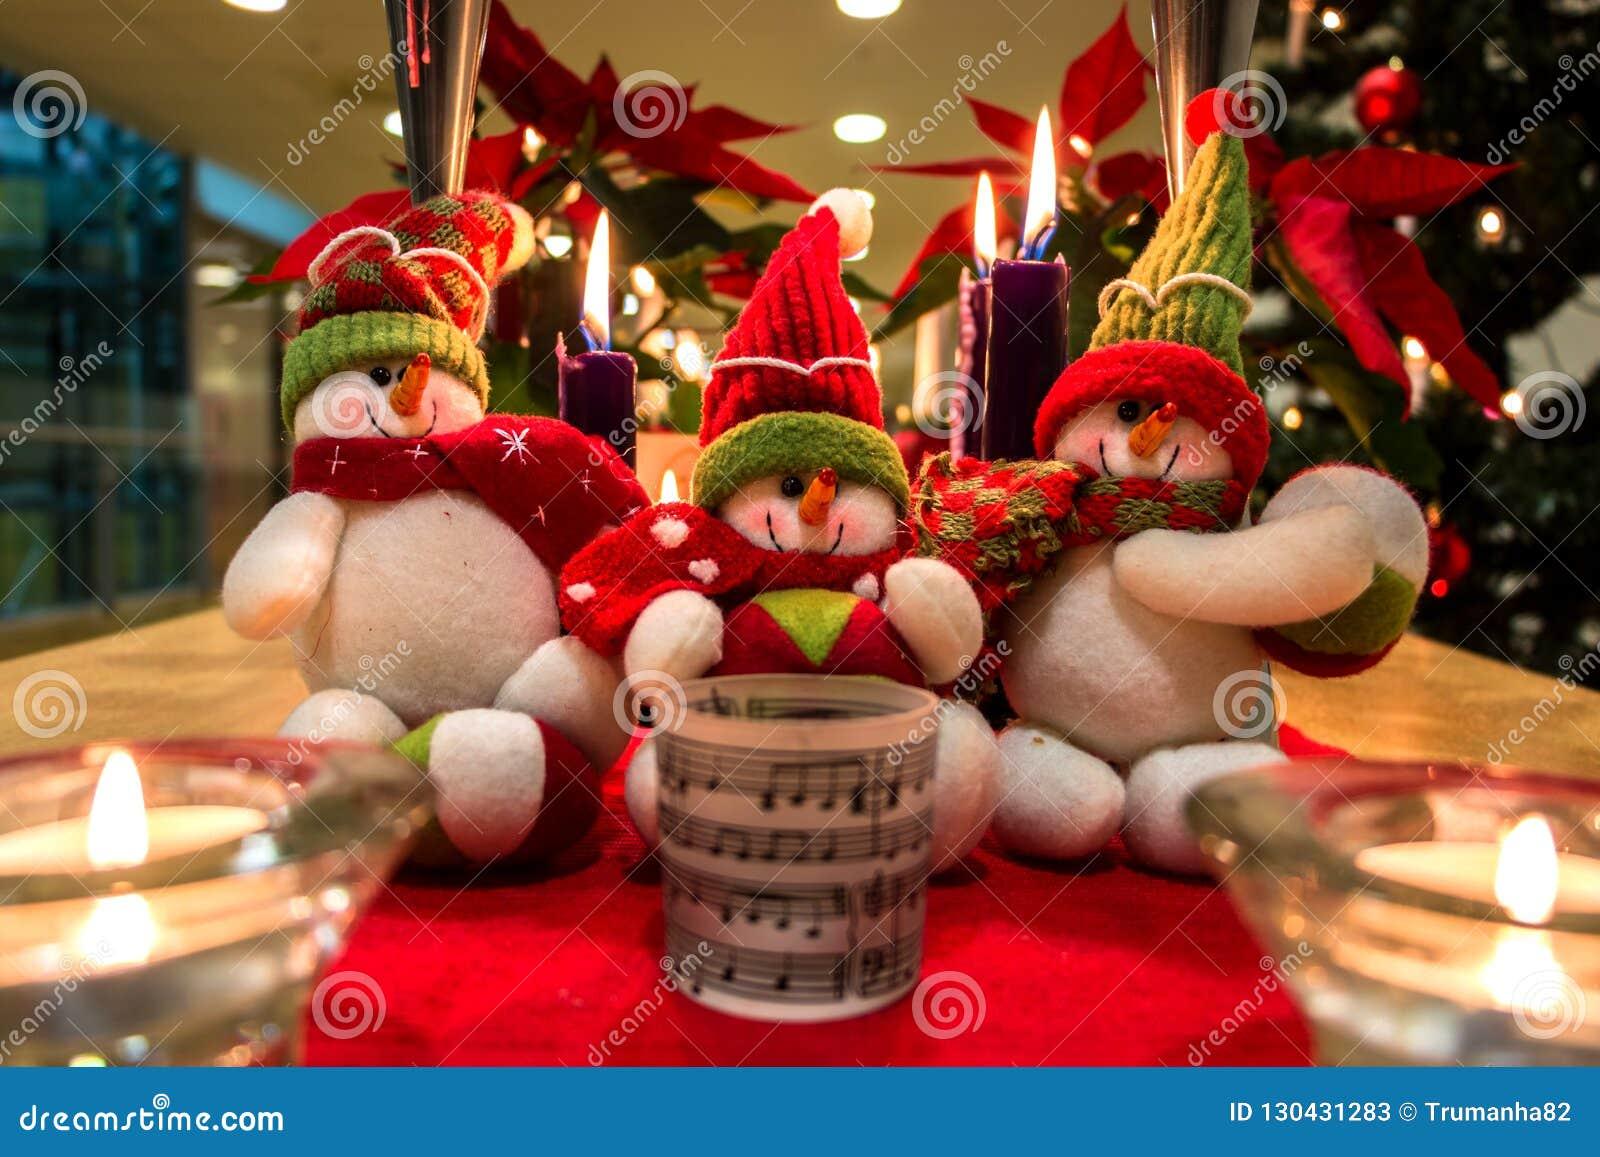 Christmas Snowmen Decorations.Christmas Snowmen Decorations Stock Image Image Of